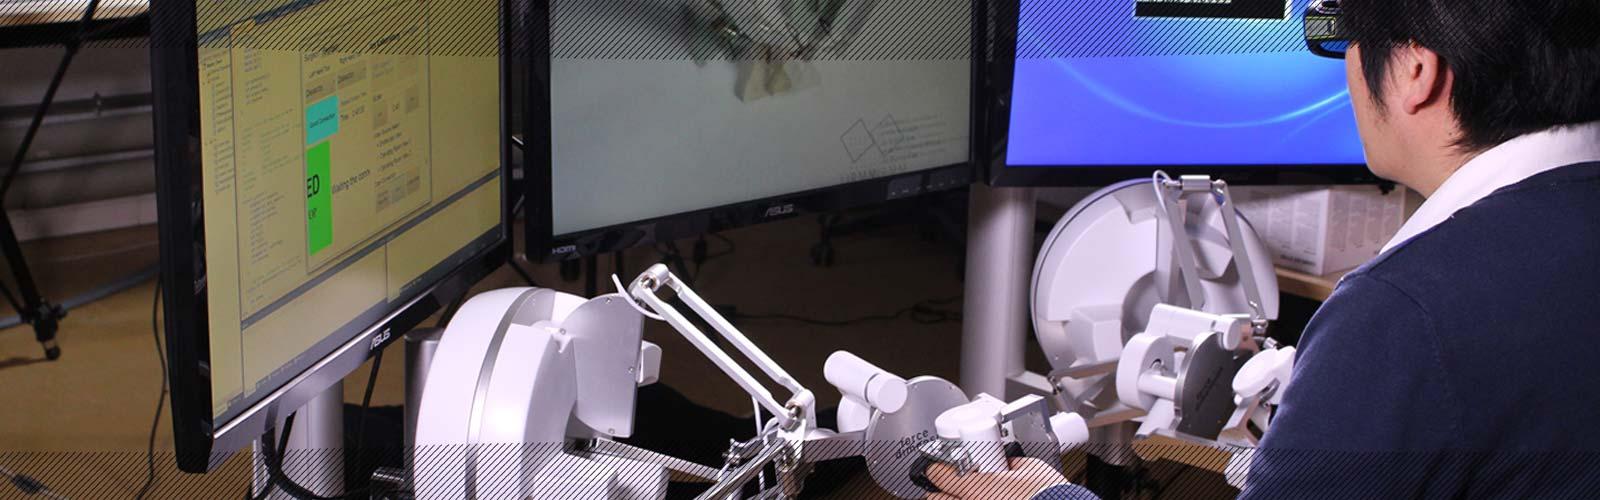 Robots chirurgie